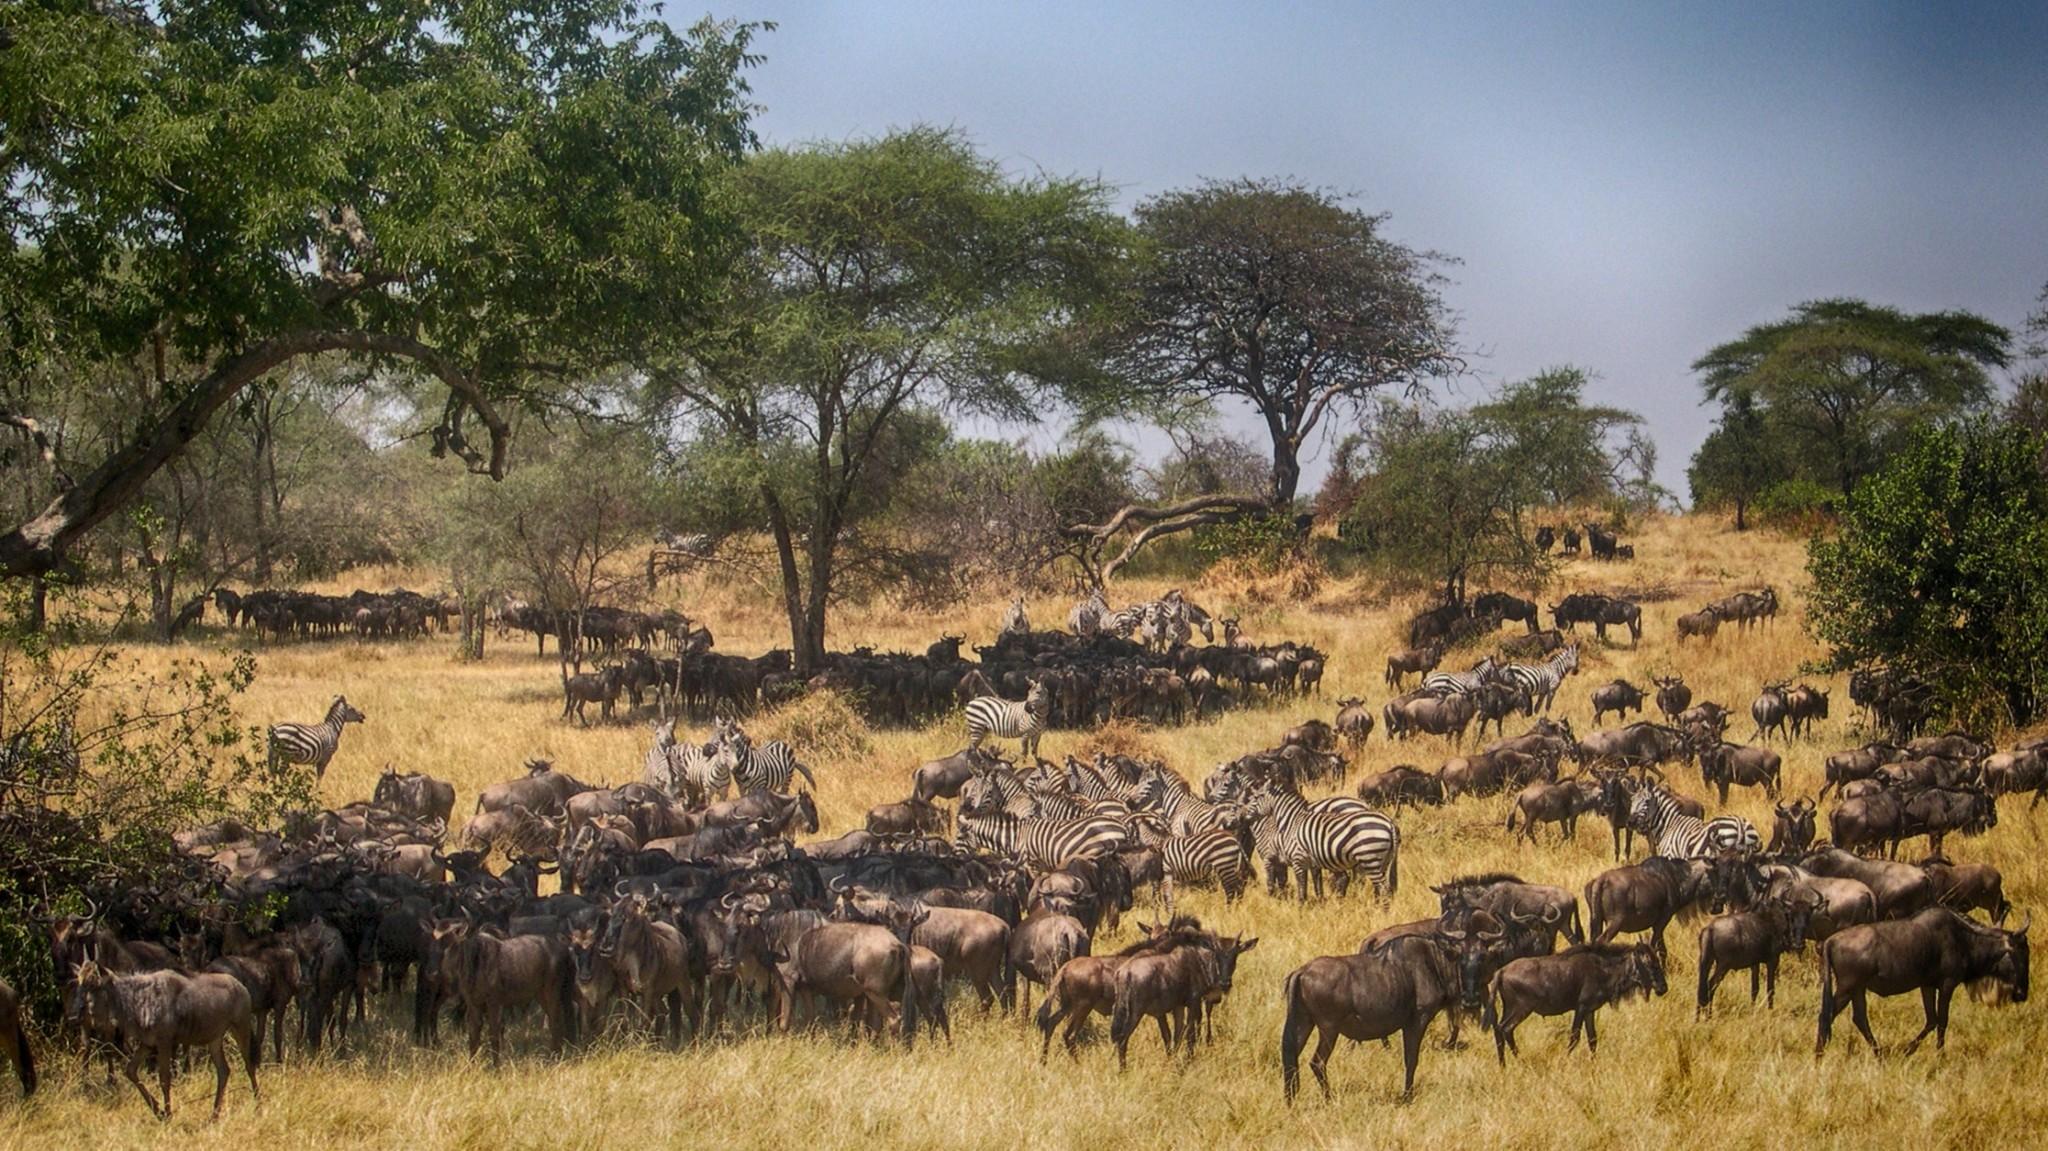 Migrating zebras and wildebeest in Tanzania